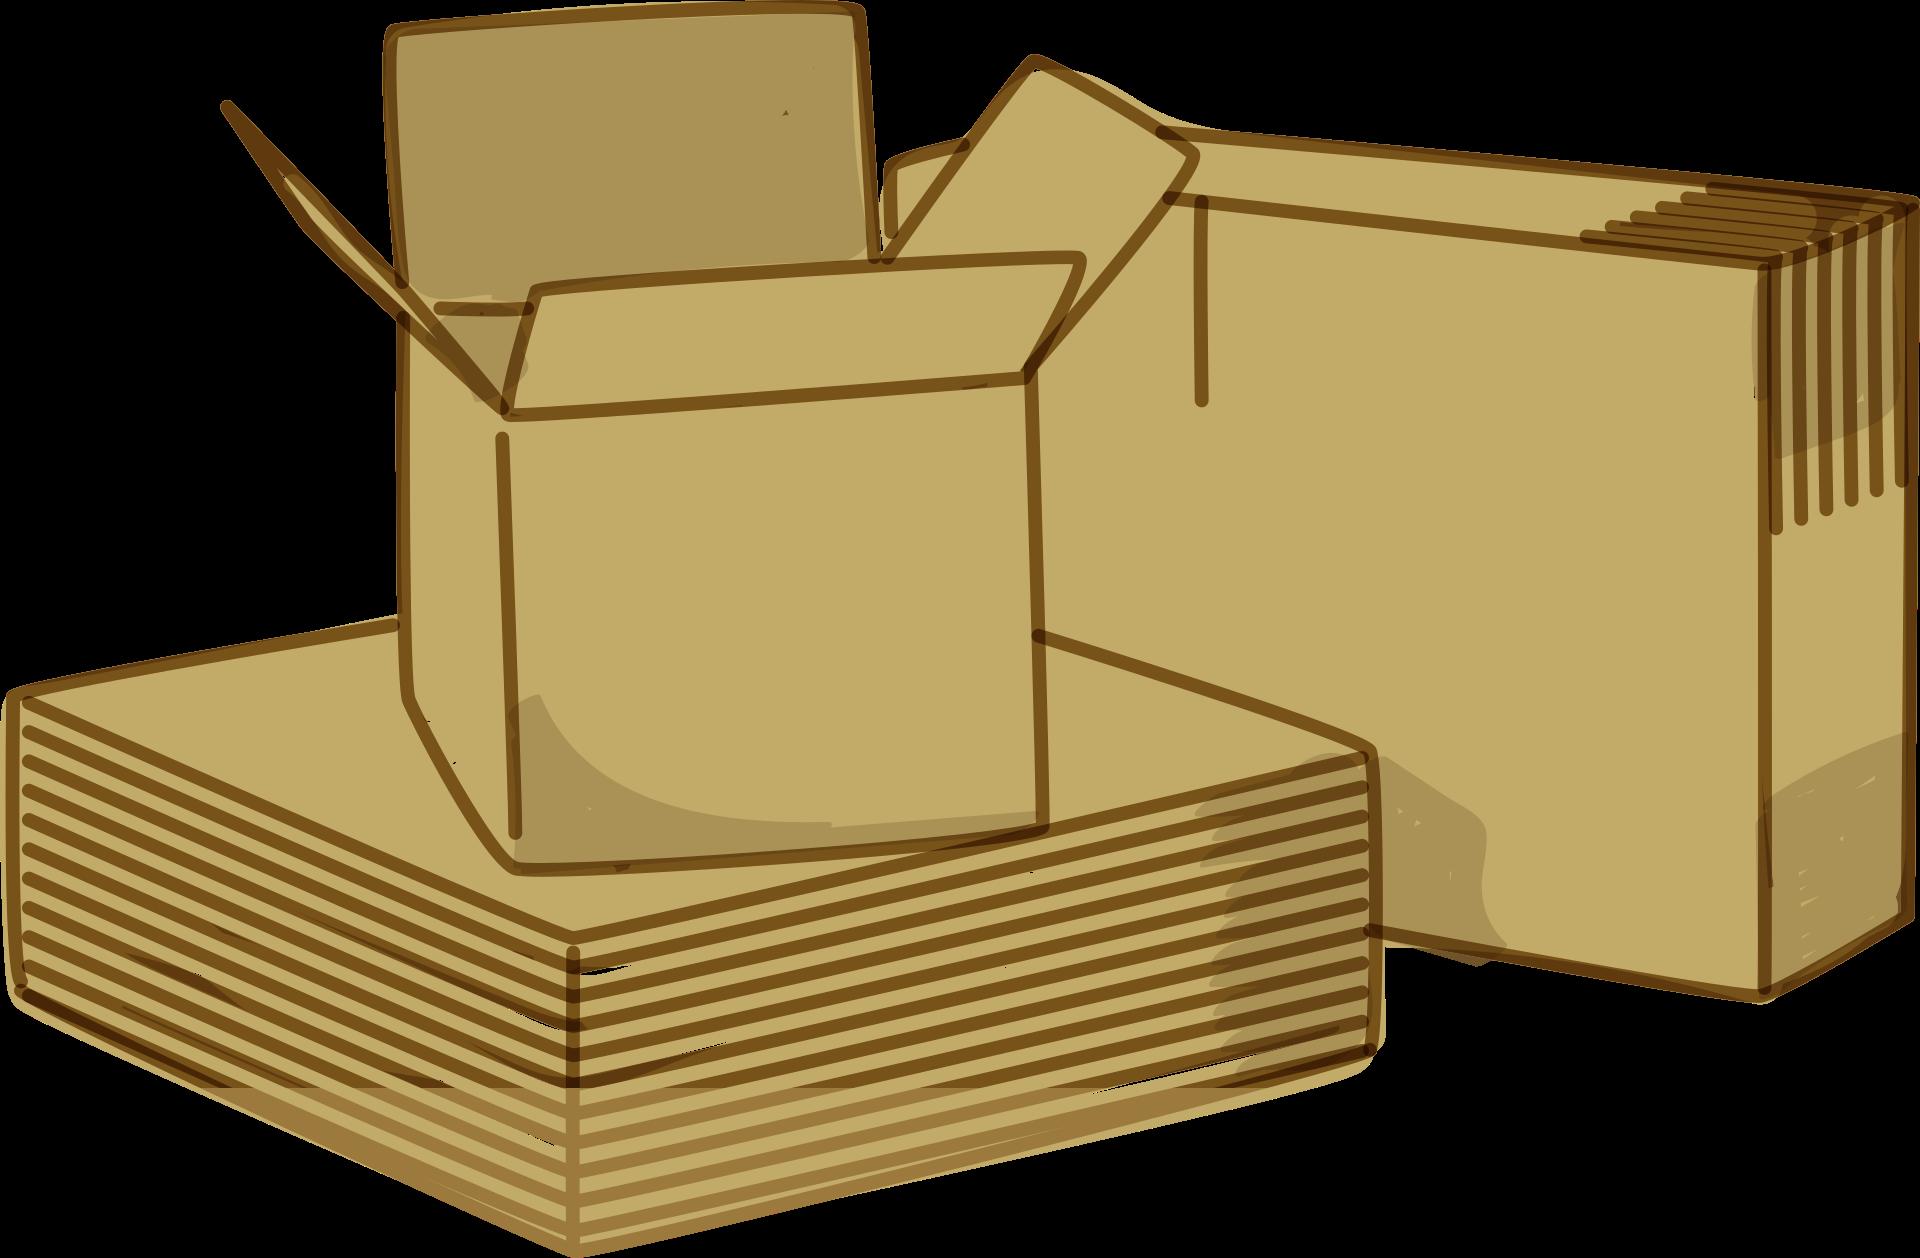 boxes-4386249